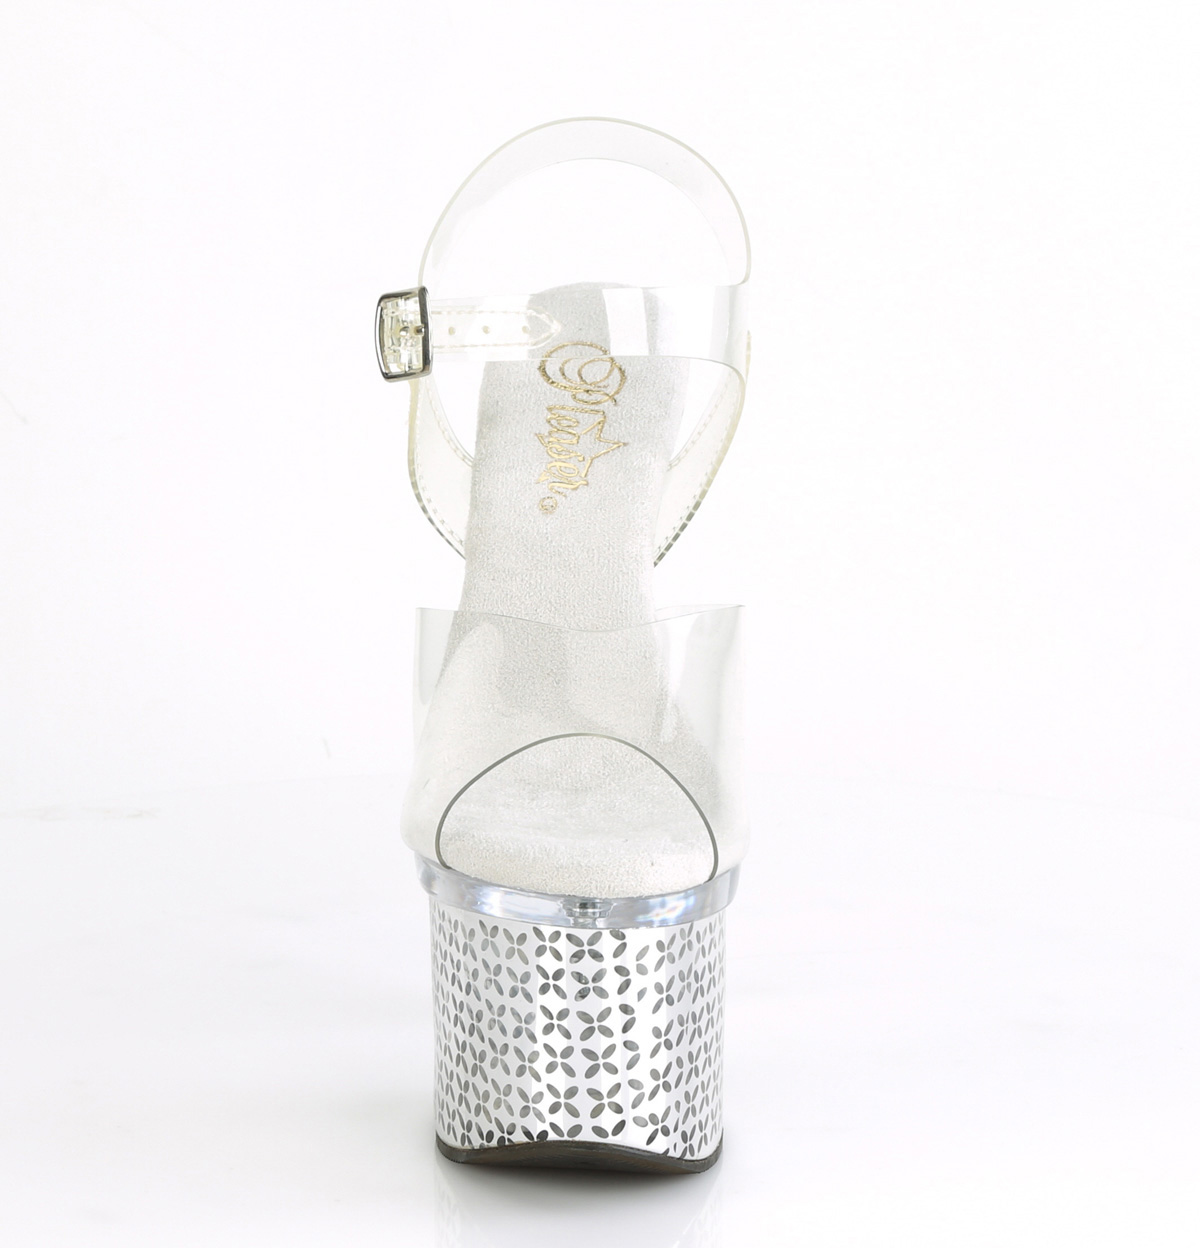 Pleaser(プリーザー) DISCOLITE-708FLP LEDイルミネーション厚底サンダル USB充電 クリア/シルバークローム(花柄)◆取り寄せ